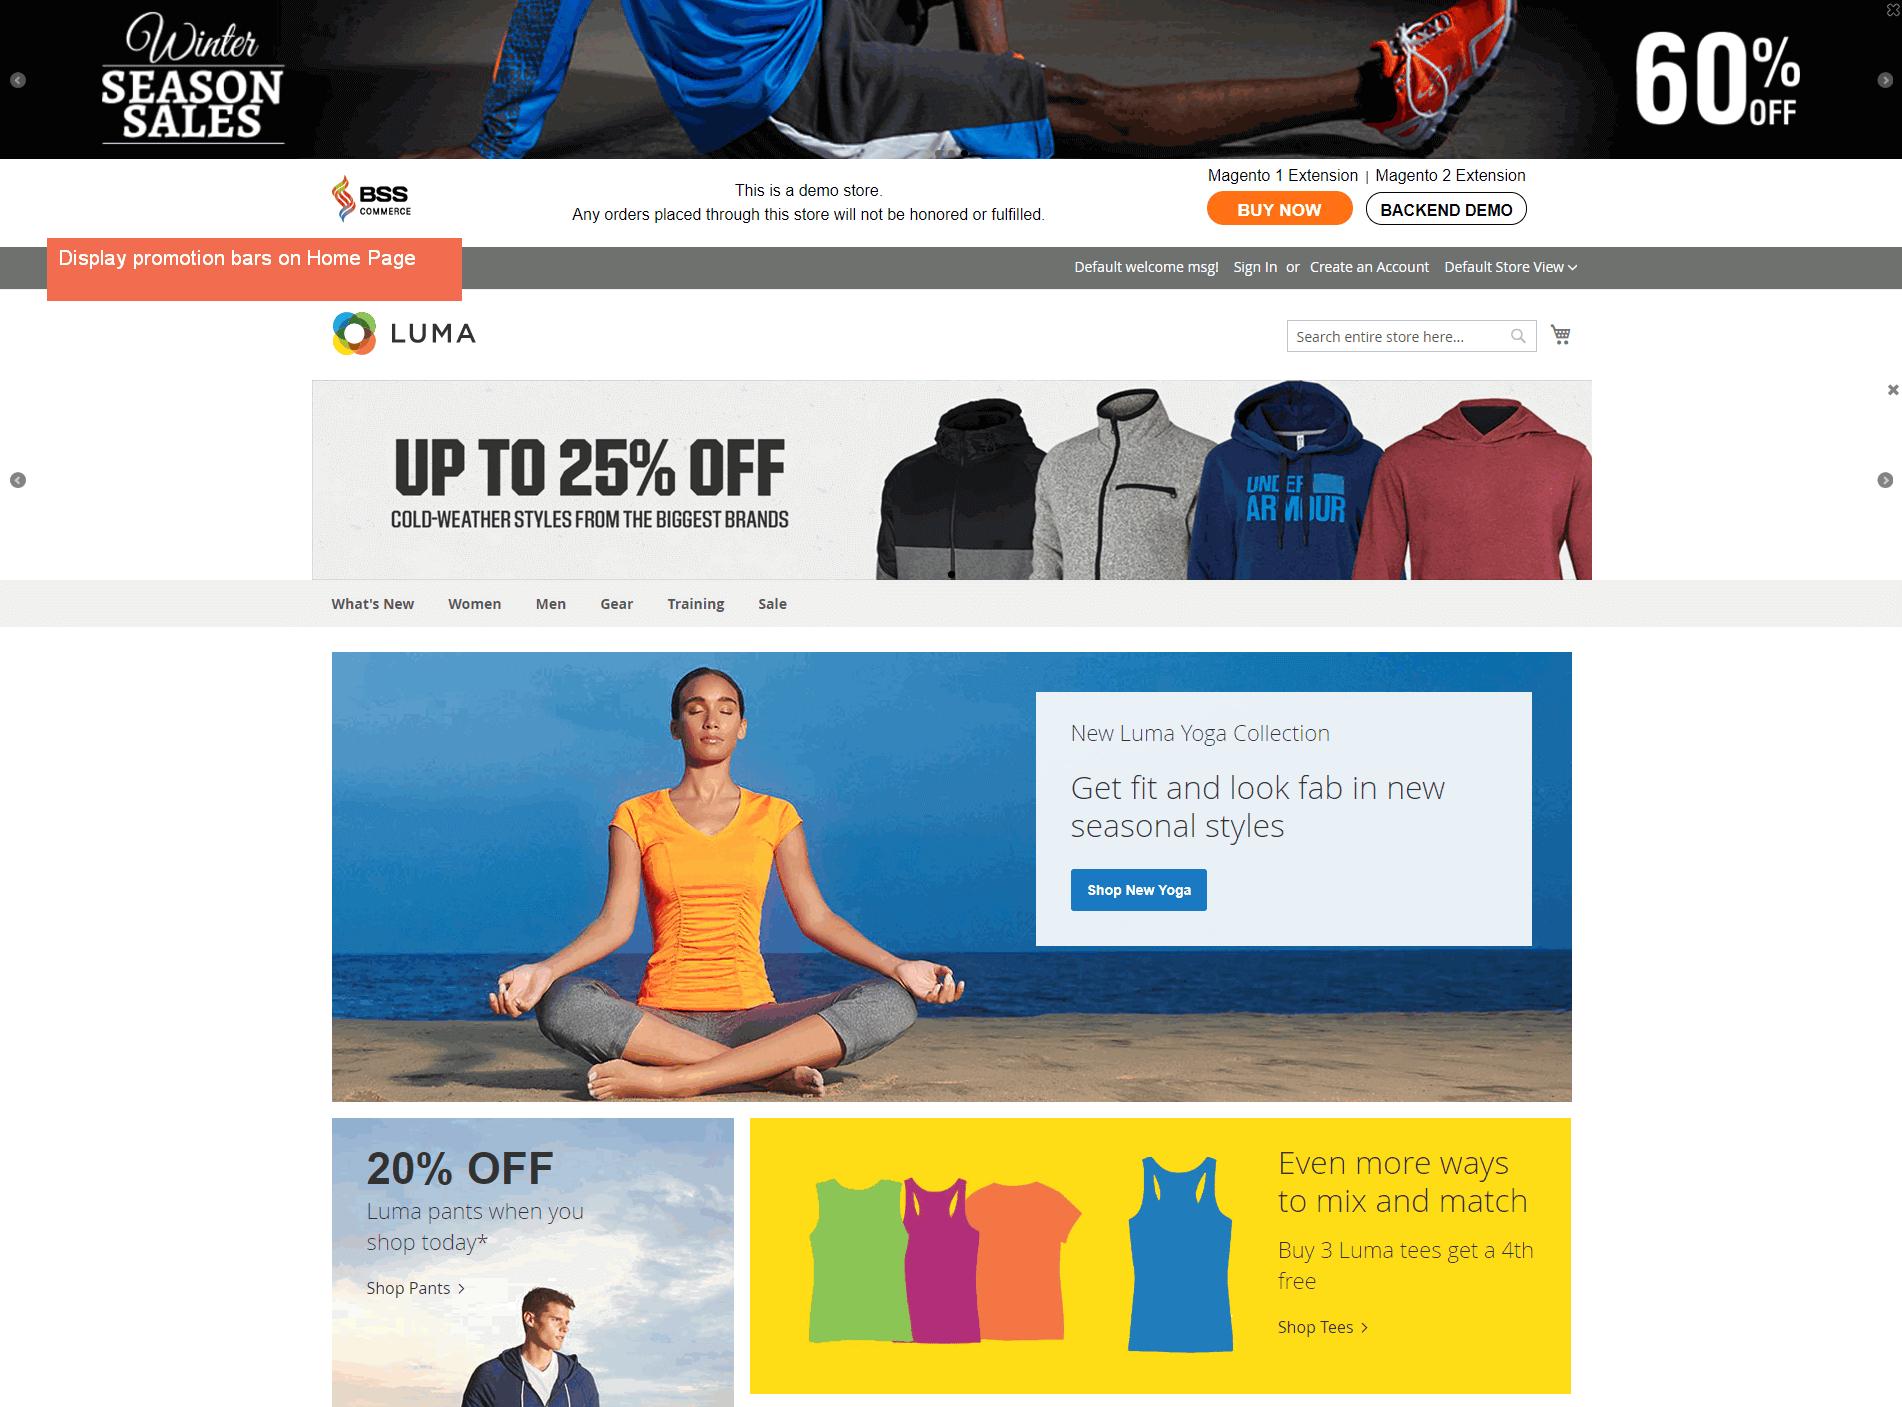 magento-2-promotion-bar-display-on-homepage